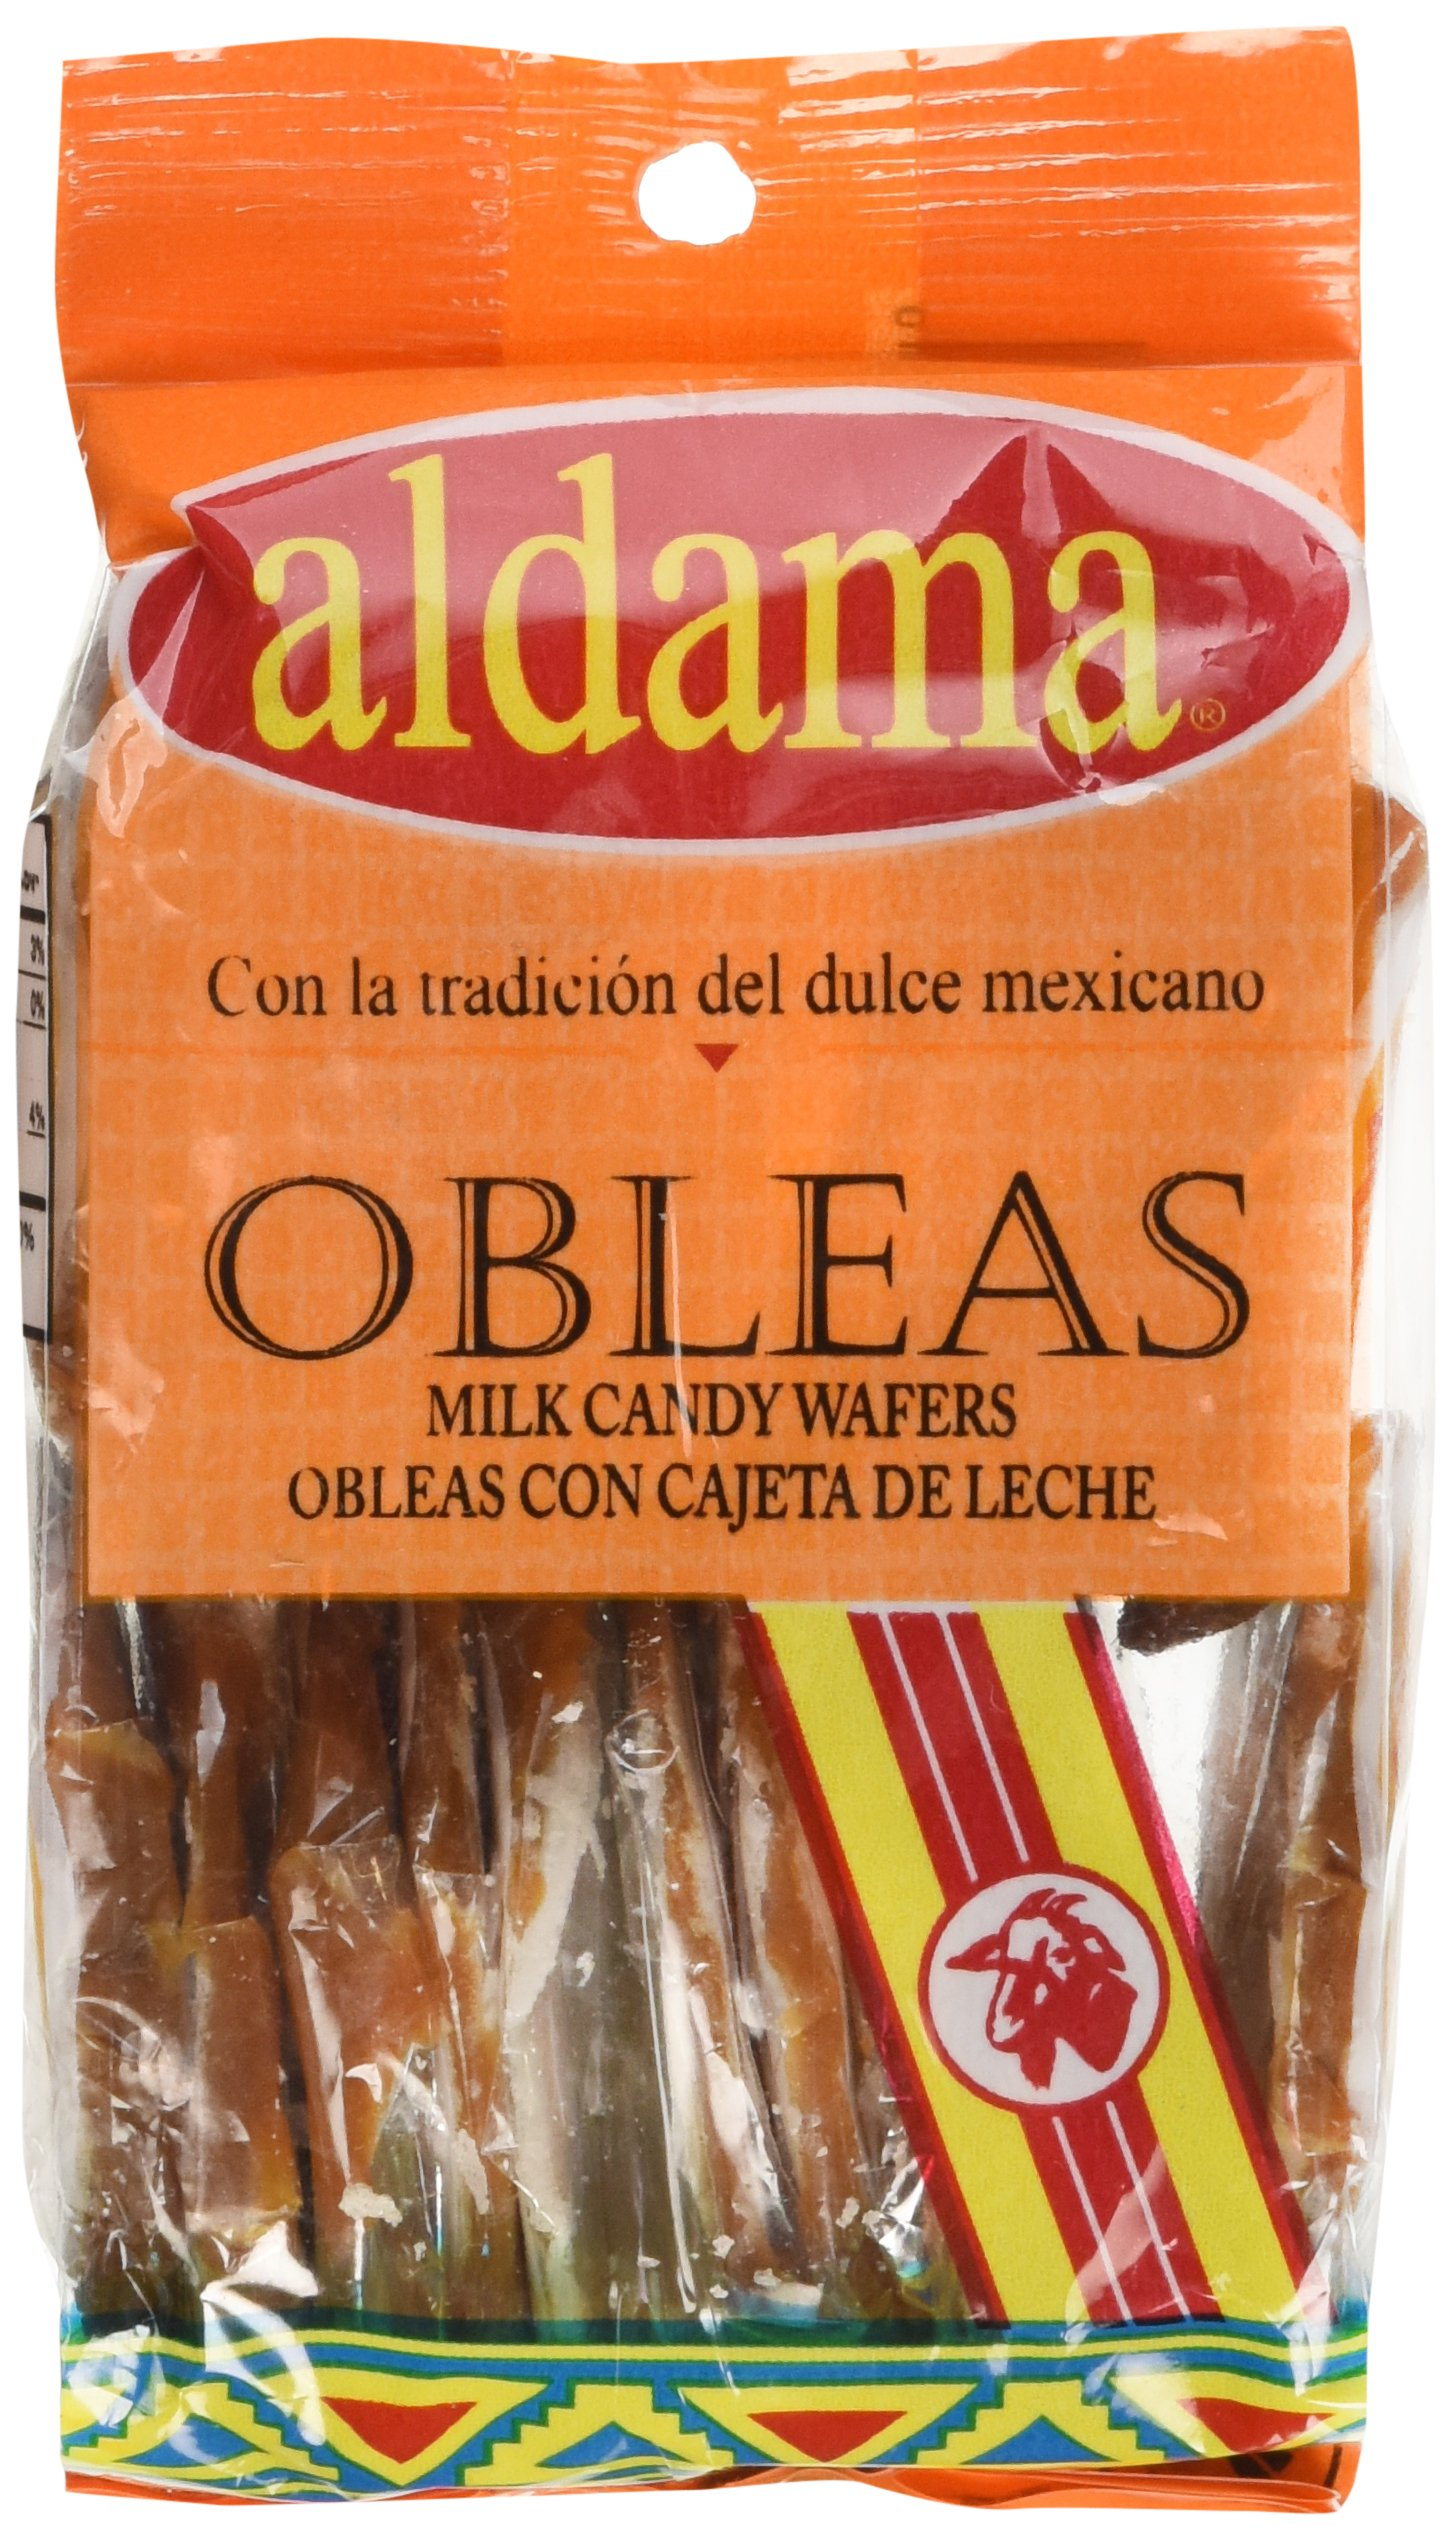 Aldama Mini Obleas Con Cajeta (Milk Candy Wafers) 20pc in Pack